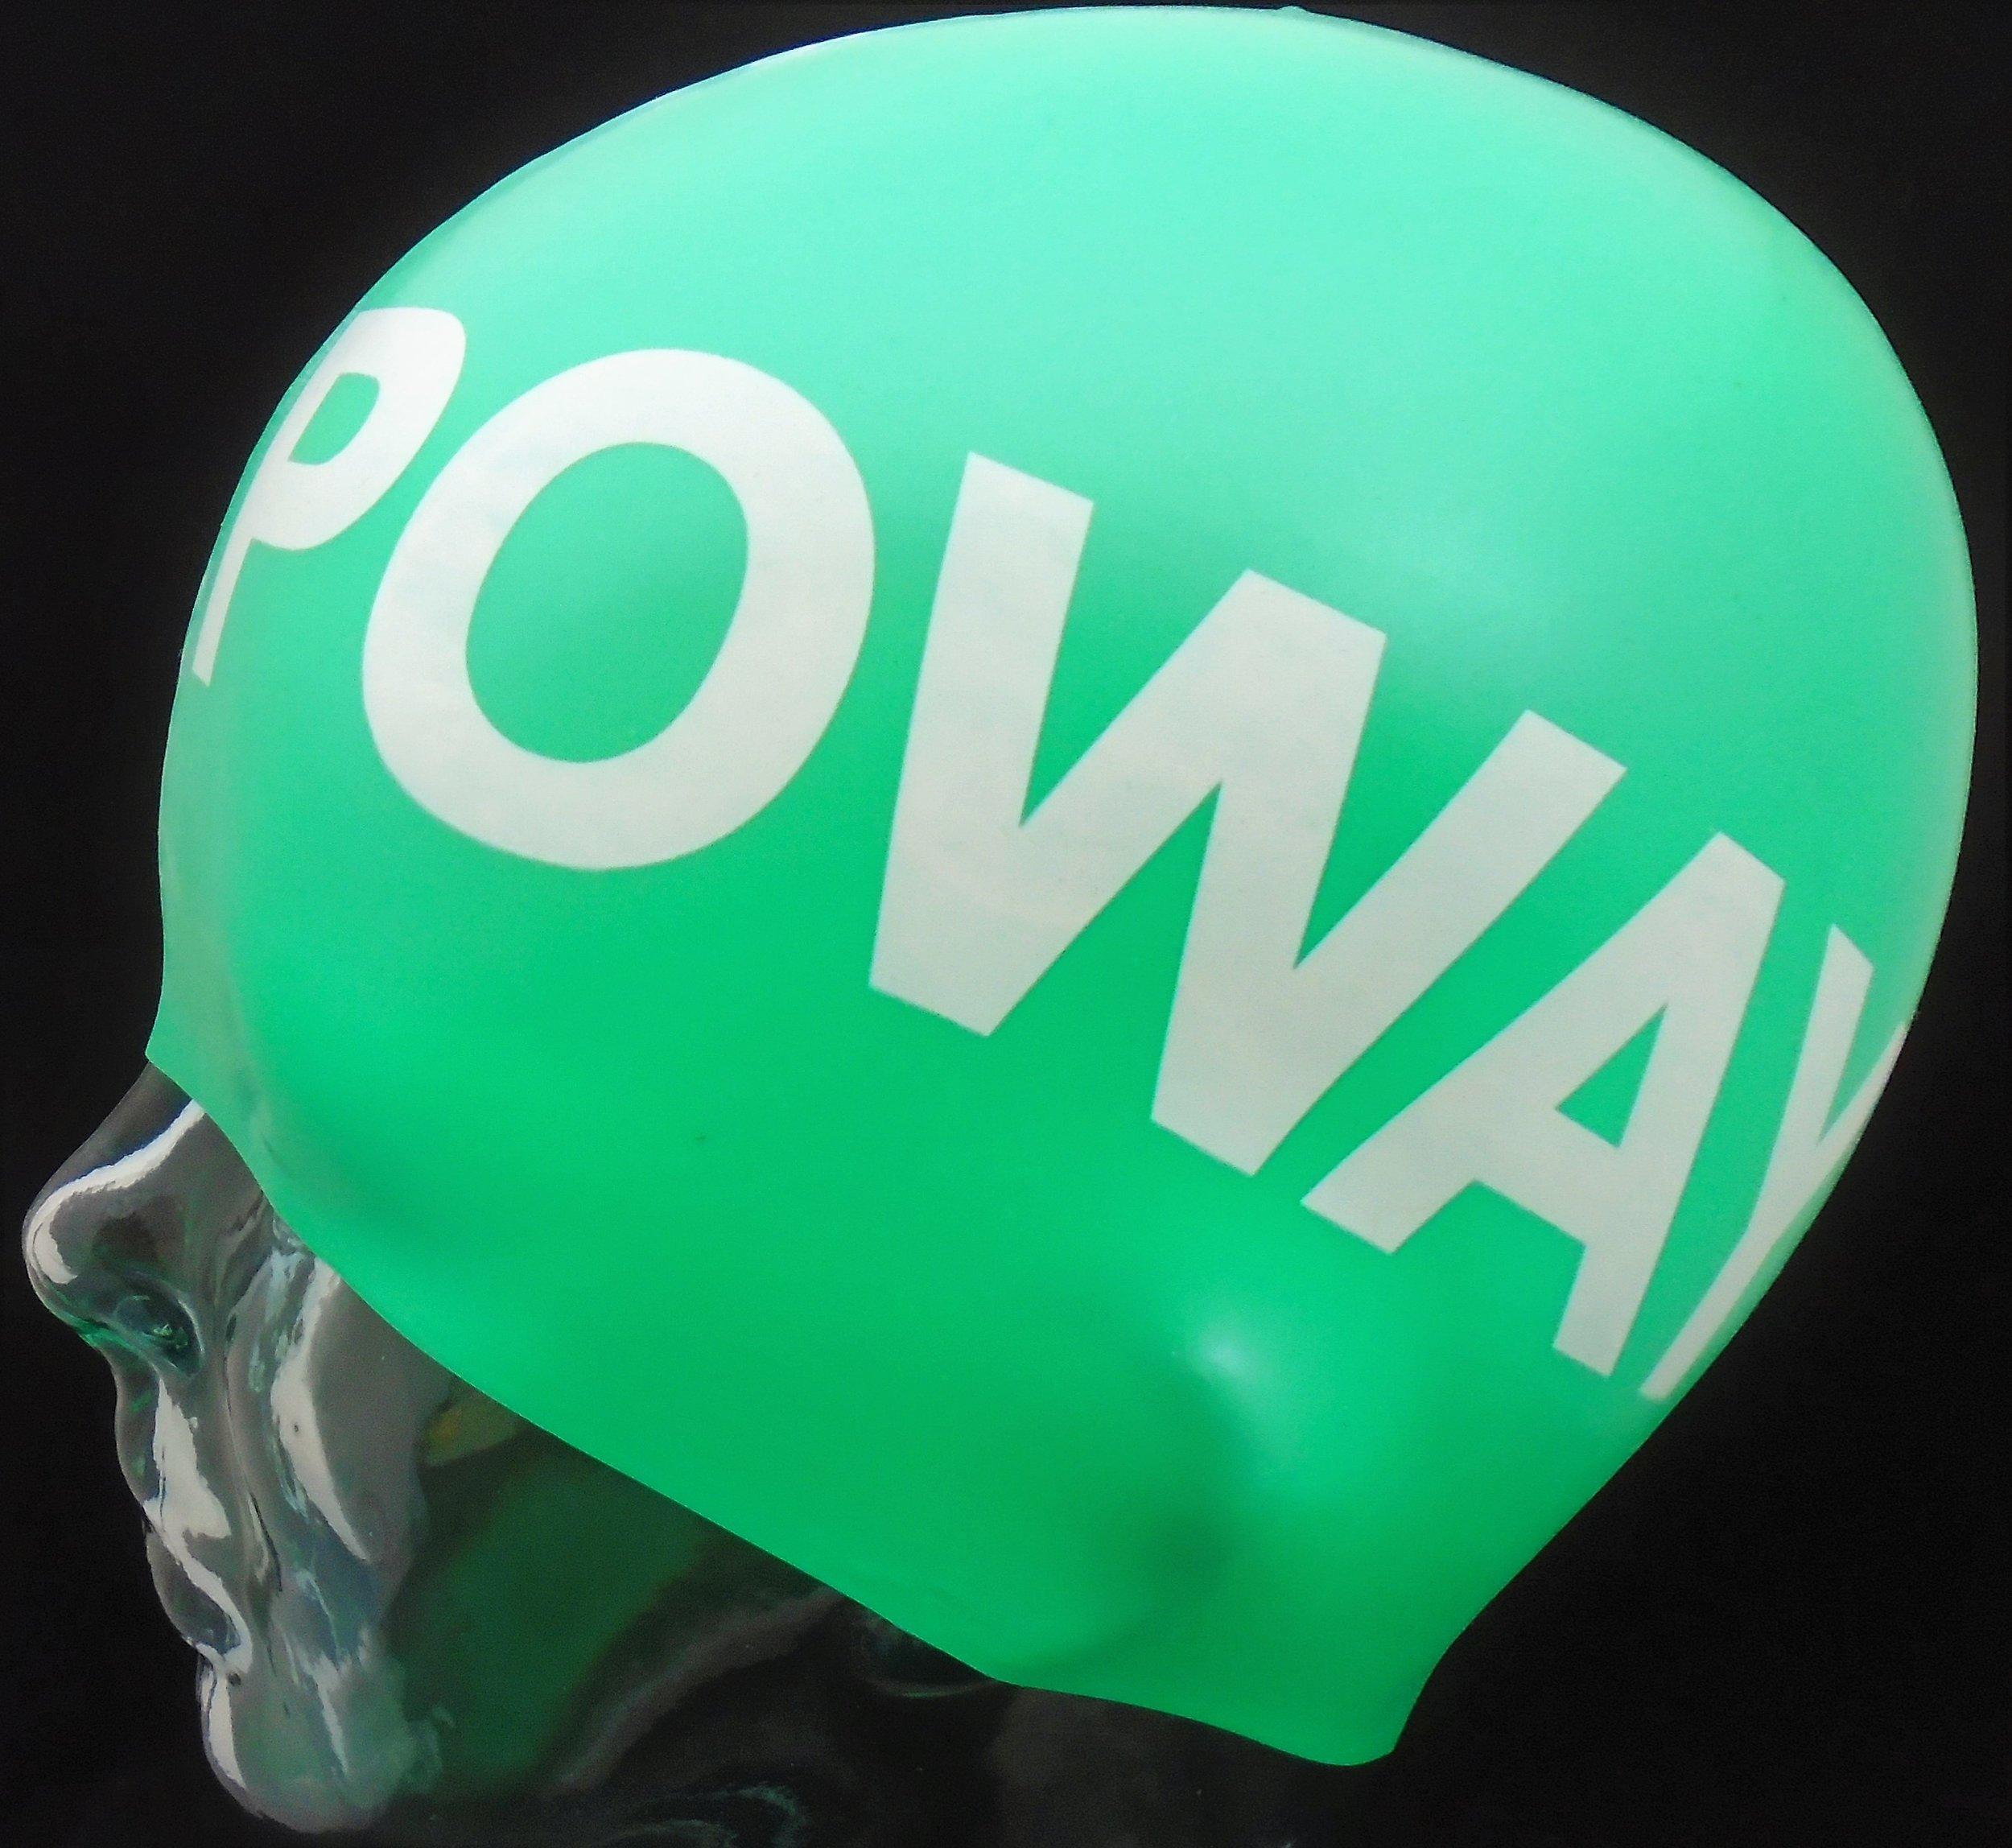 Poway green cap.jpg